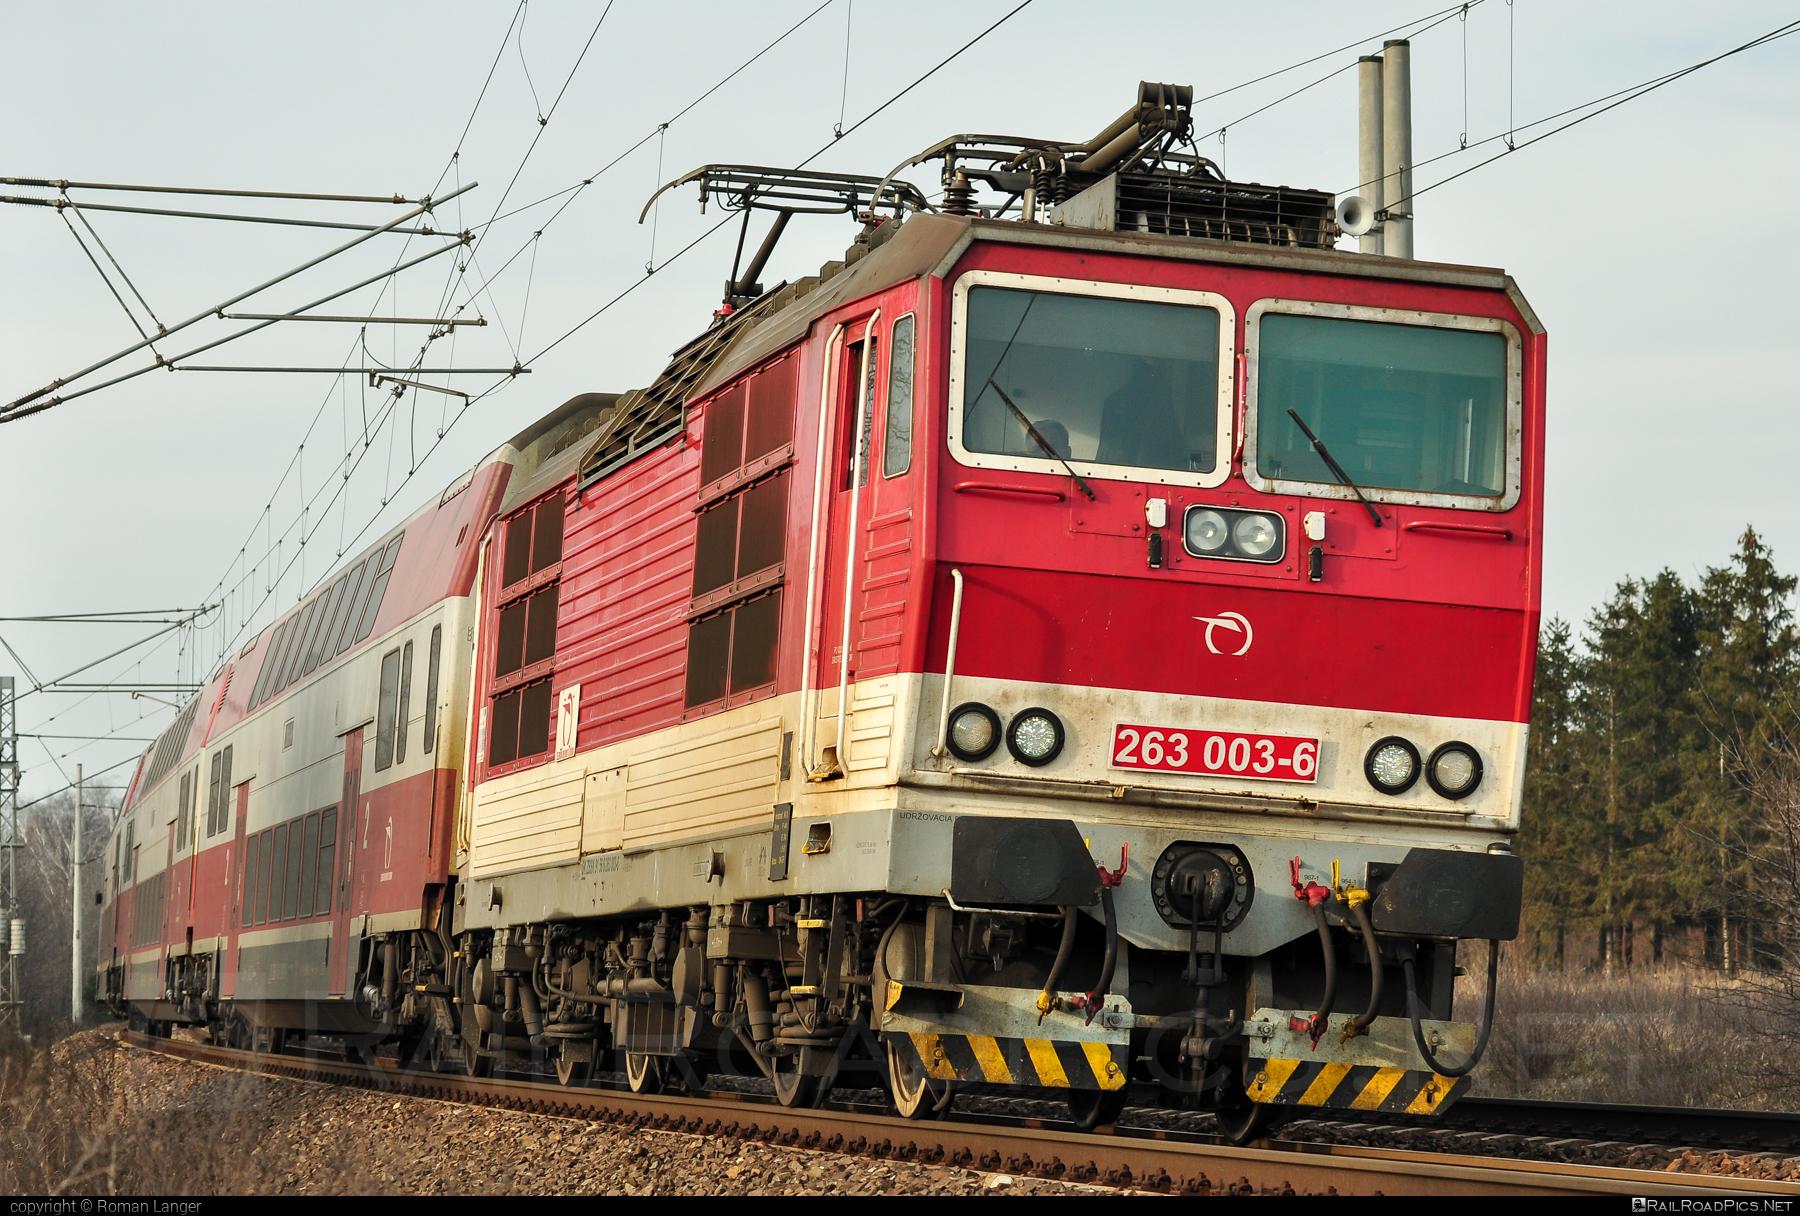 Škoda 70E - 263 003-6 operated by Železničná Spoločnost' Slovensko, a.s. #ZeleznicnaSpolocnostSlovensko #locomotive263 #princezna #skoda #skoda70e #zssk